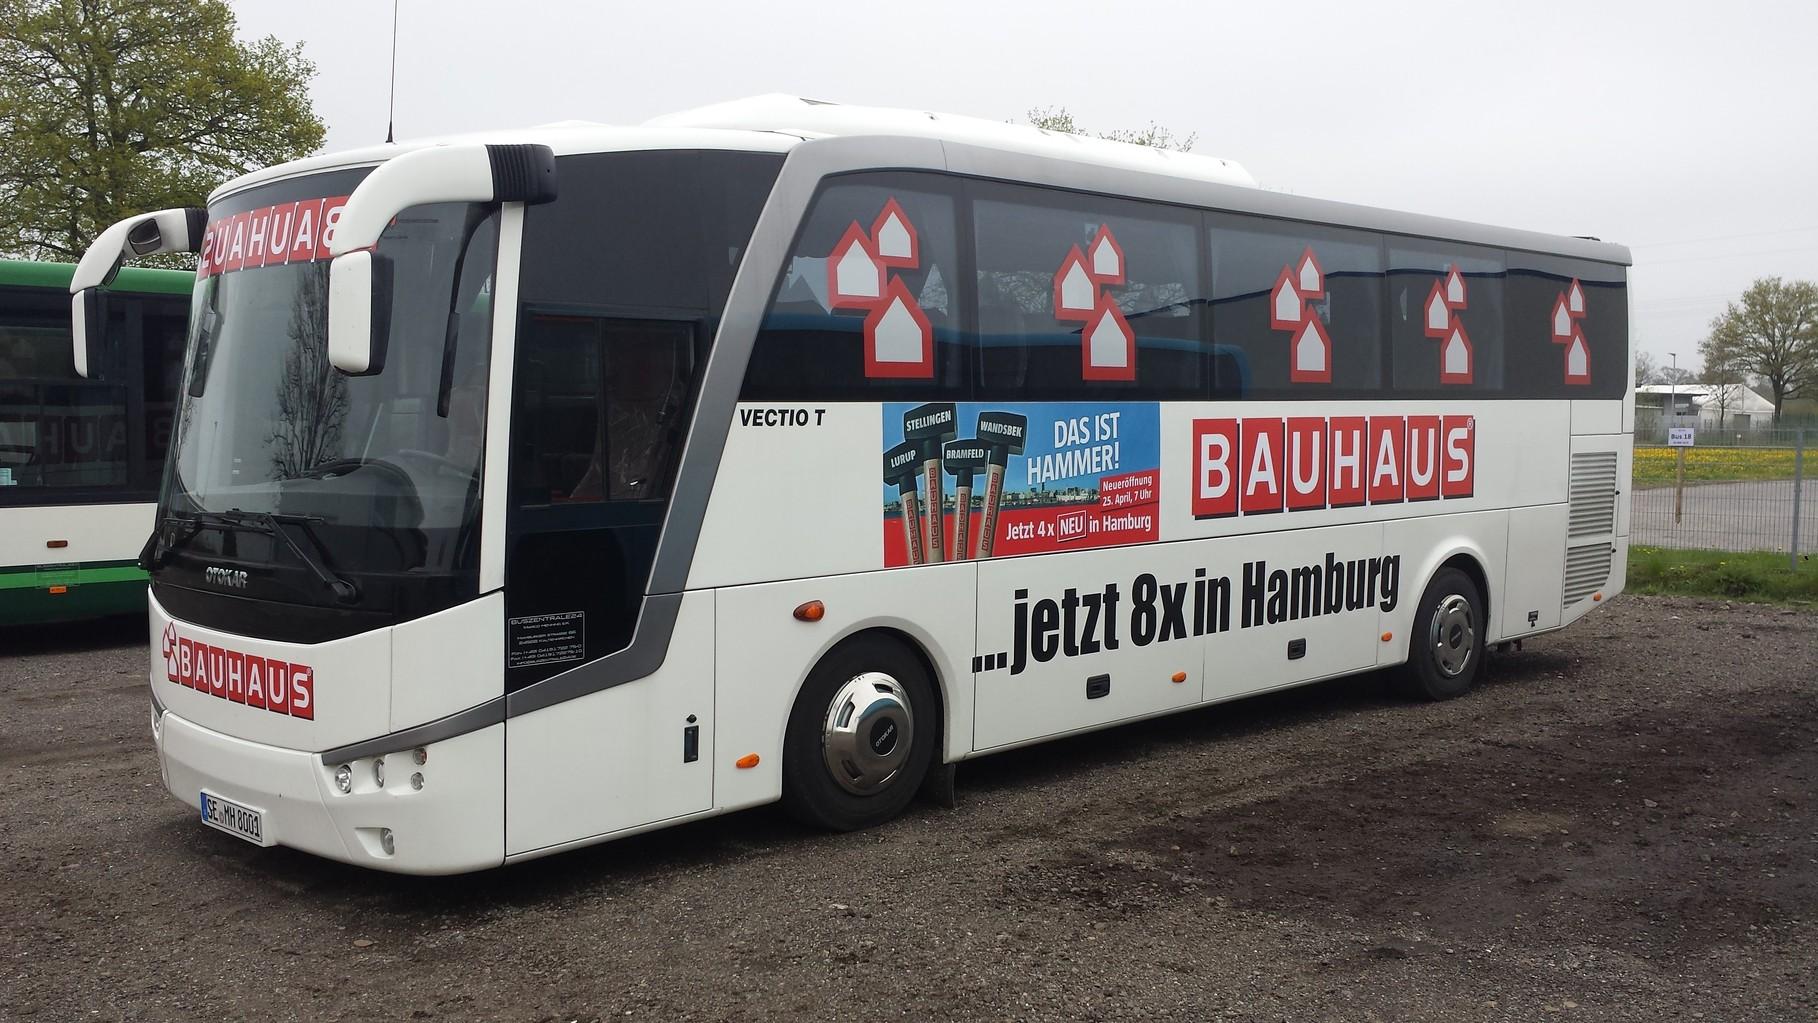 Bauhaus Veranstaltungsbus